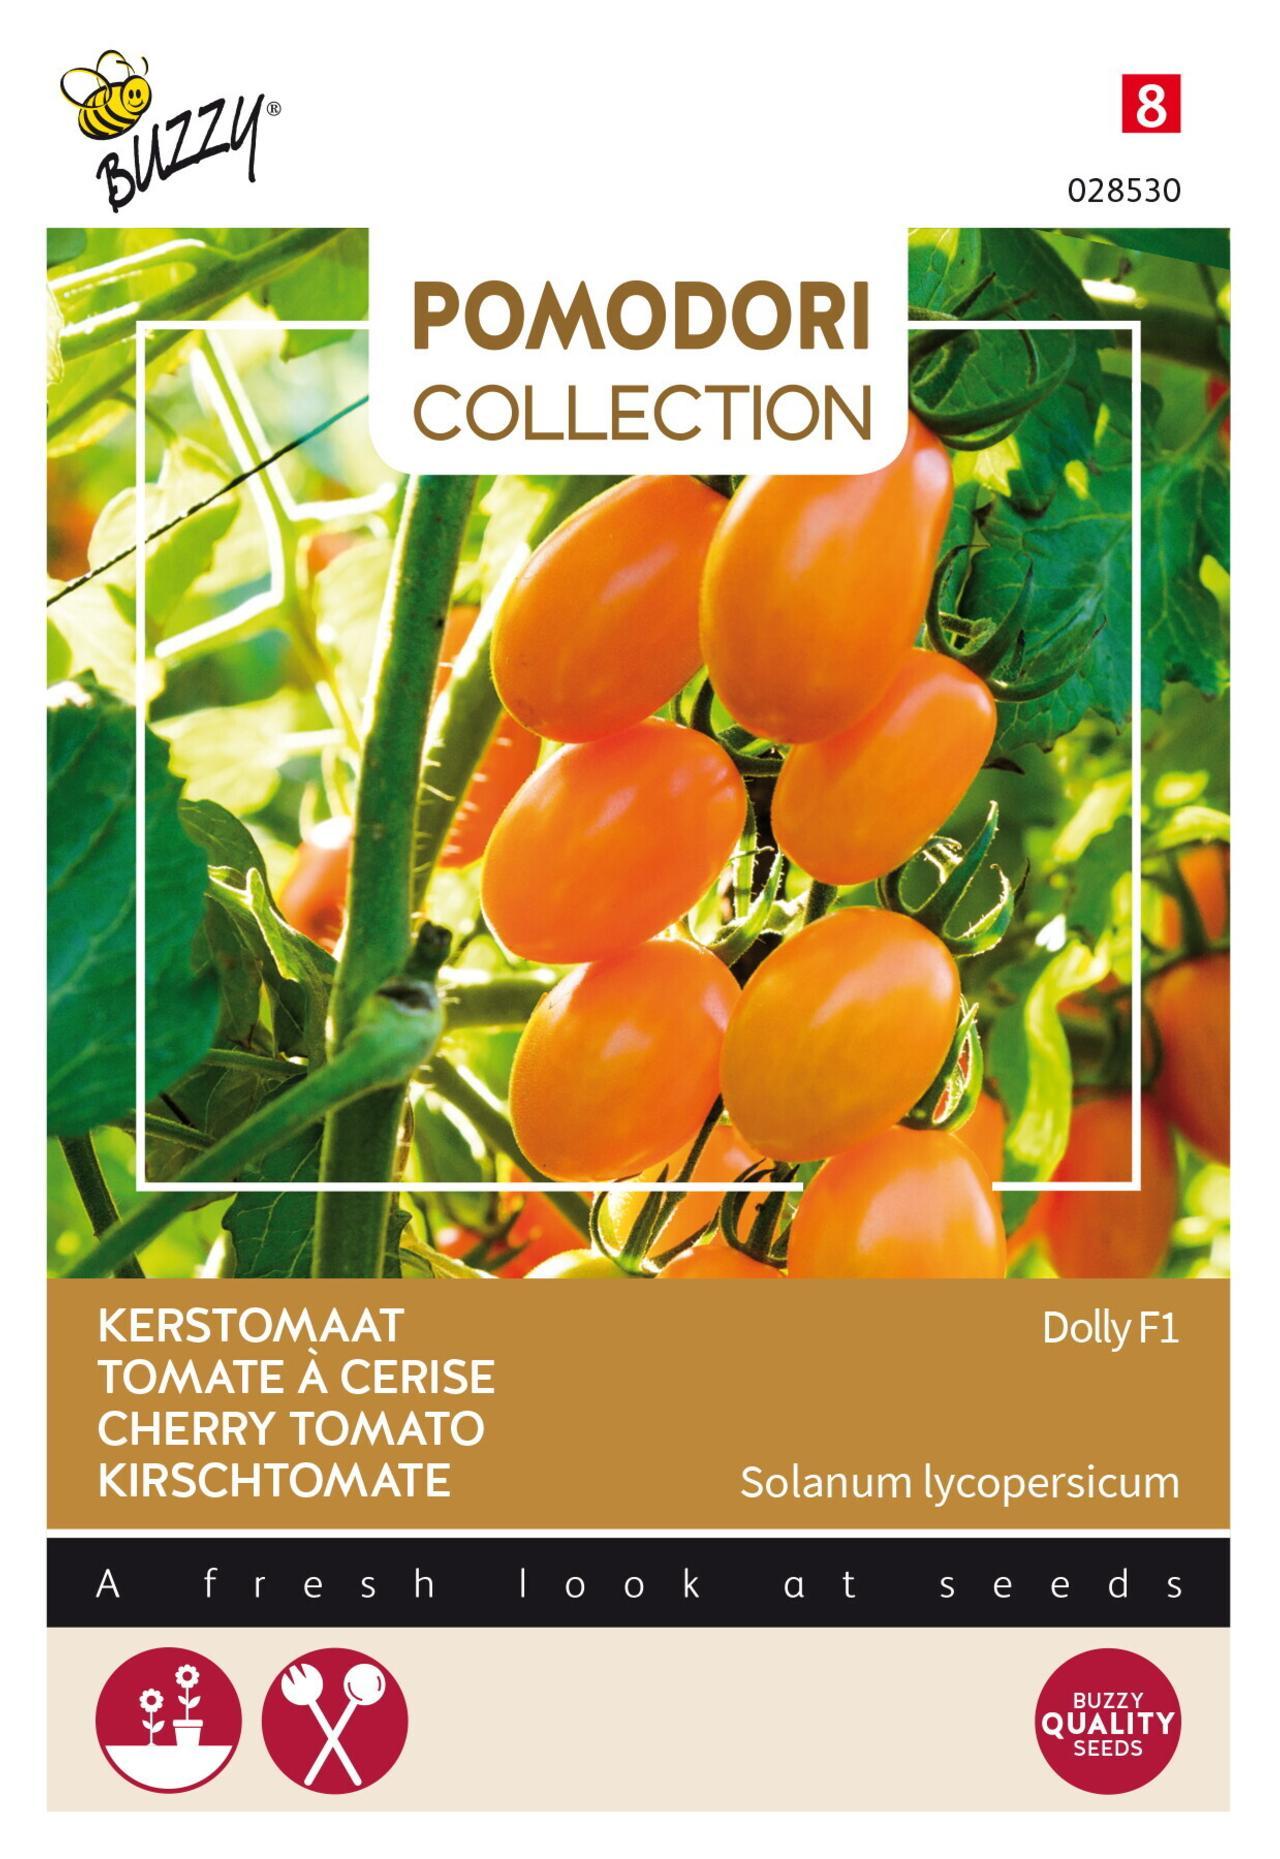 Solanum lycopersicum 'Dolly F1' plant